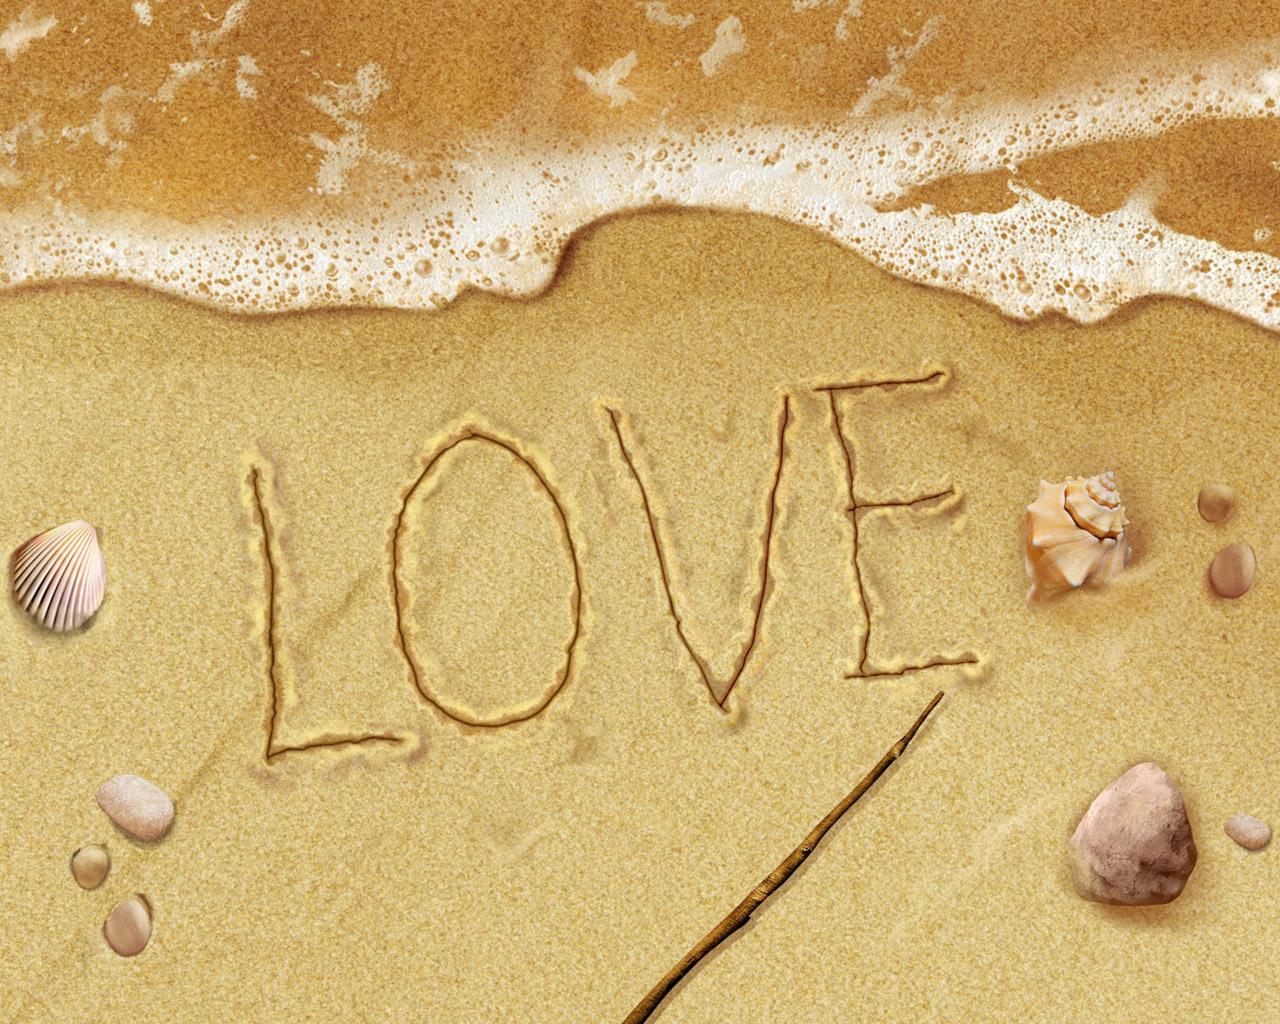 Картинки про любовь топ 50 надпись